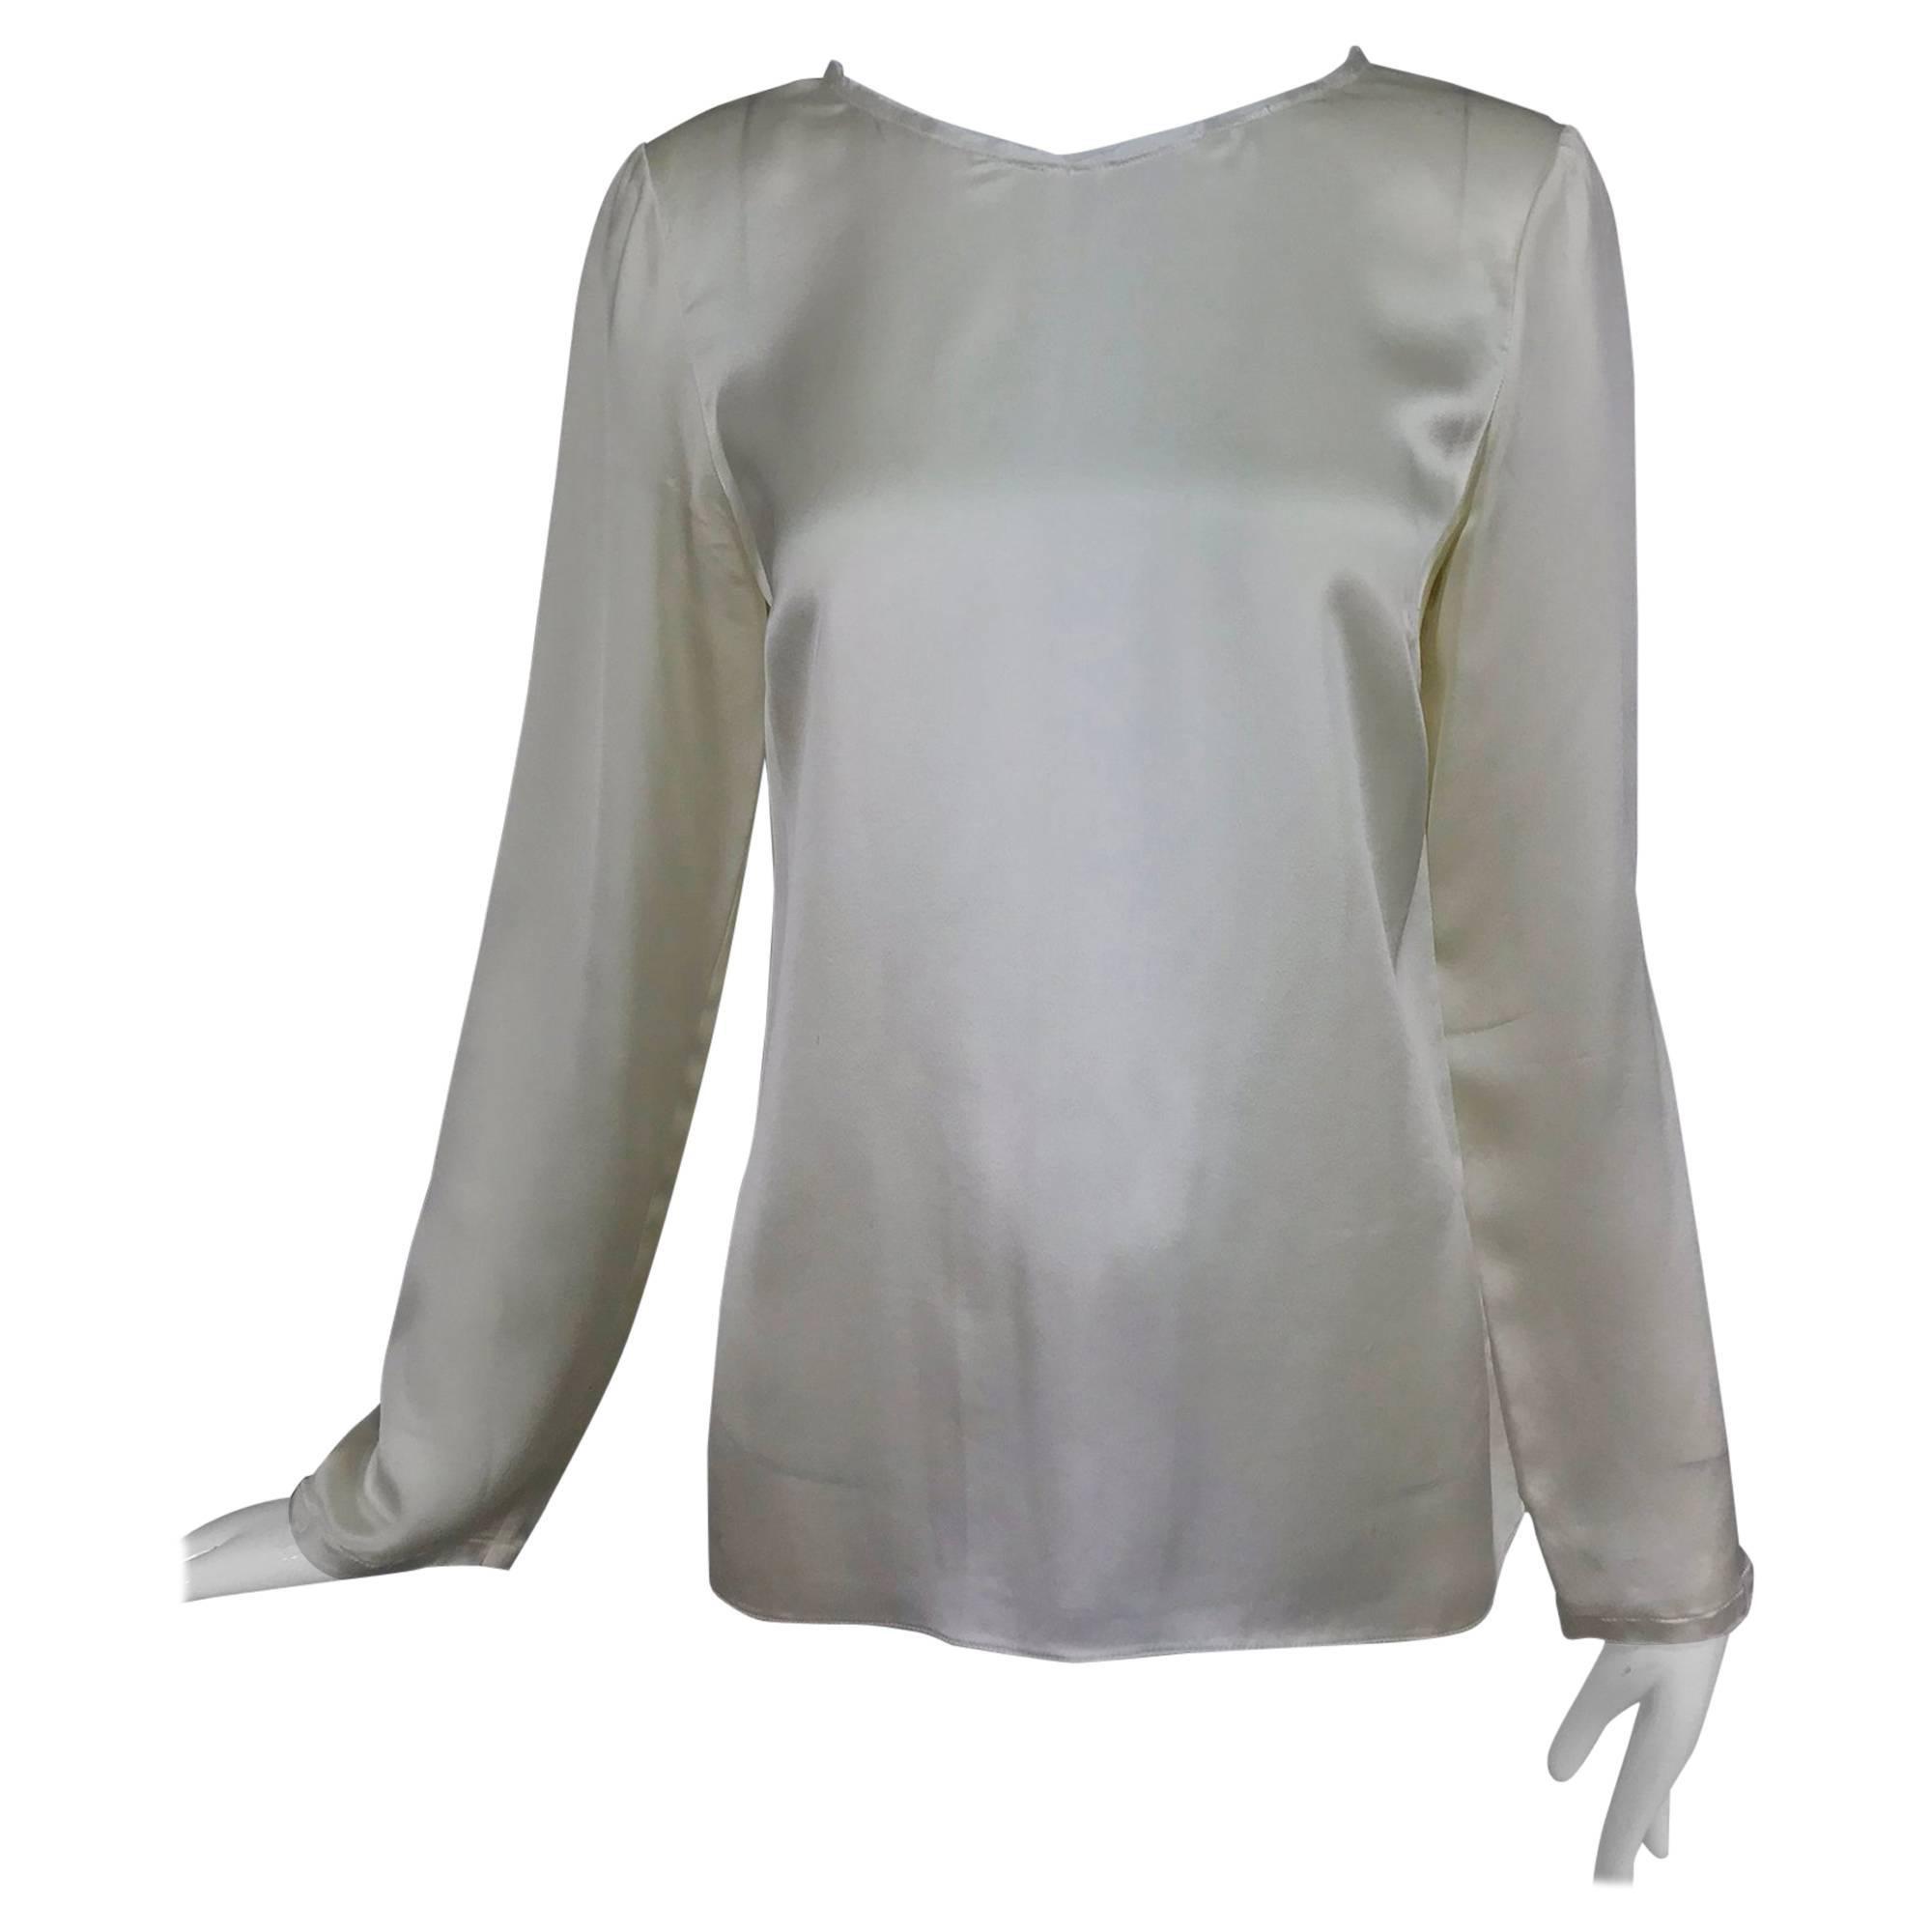 Chanel cream silk deconstructed long sleeve blouse